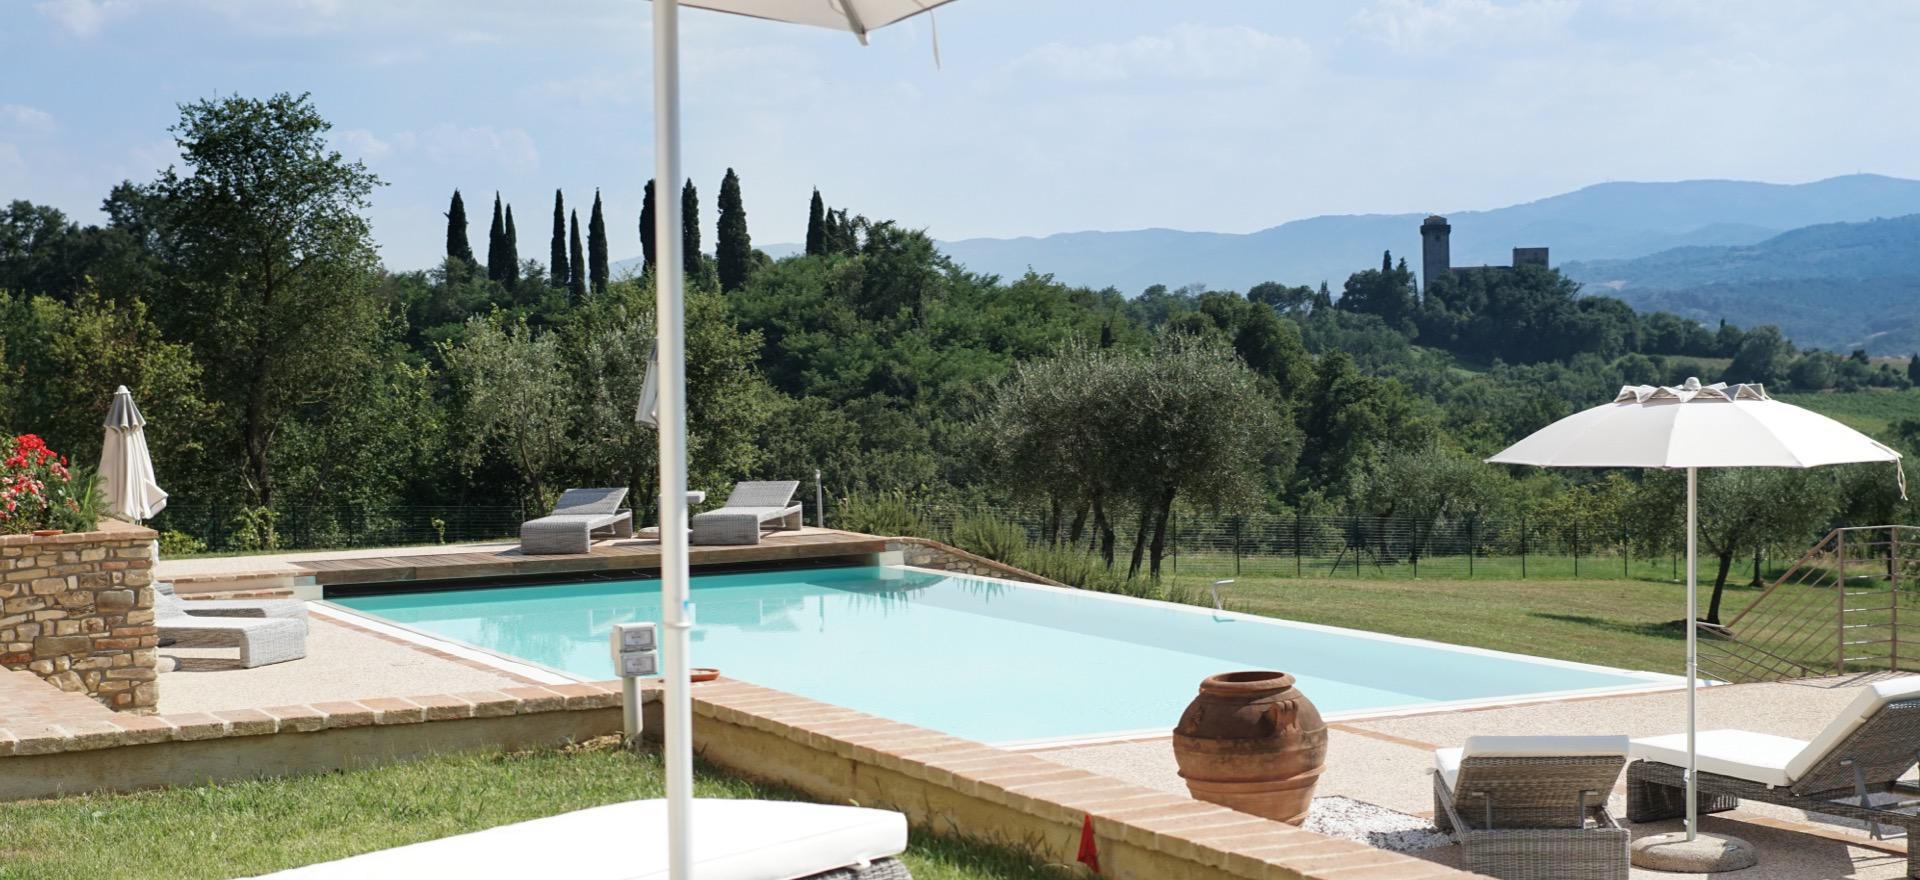 Agriturismo Tuscany Boutique B&B in elegant villa in Tuscany